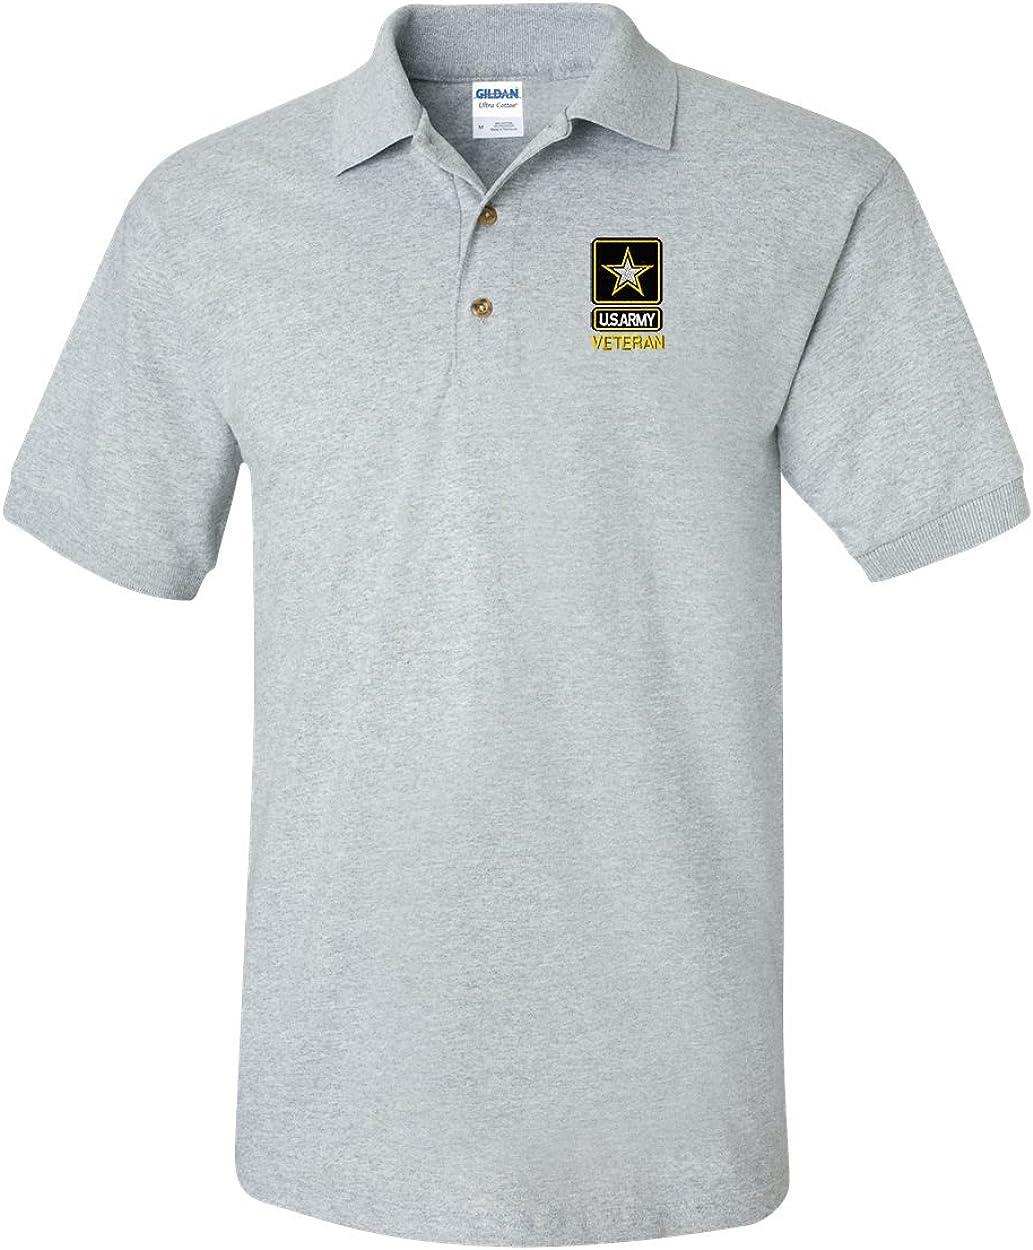 Army star design on black polo shirt Custom embroidered U.S